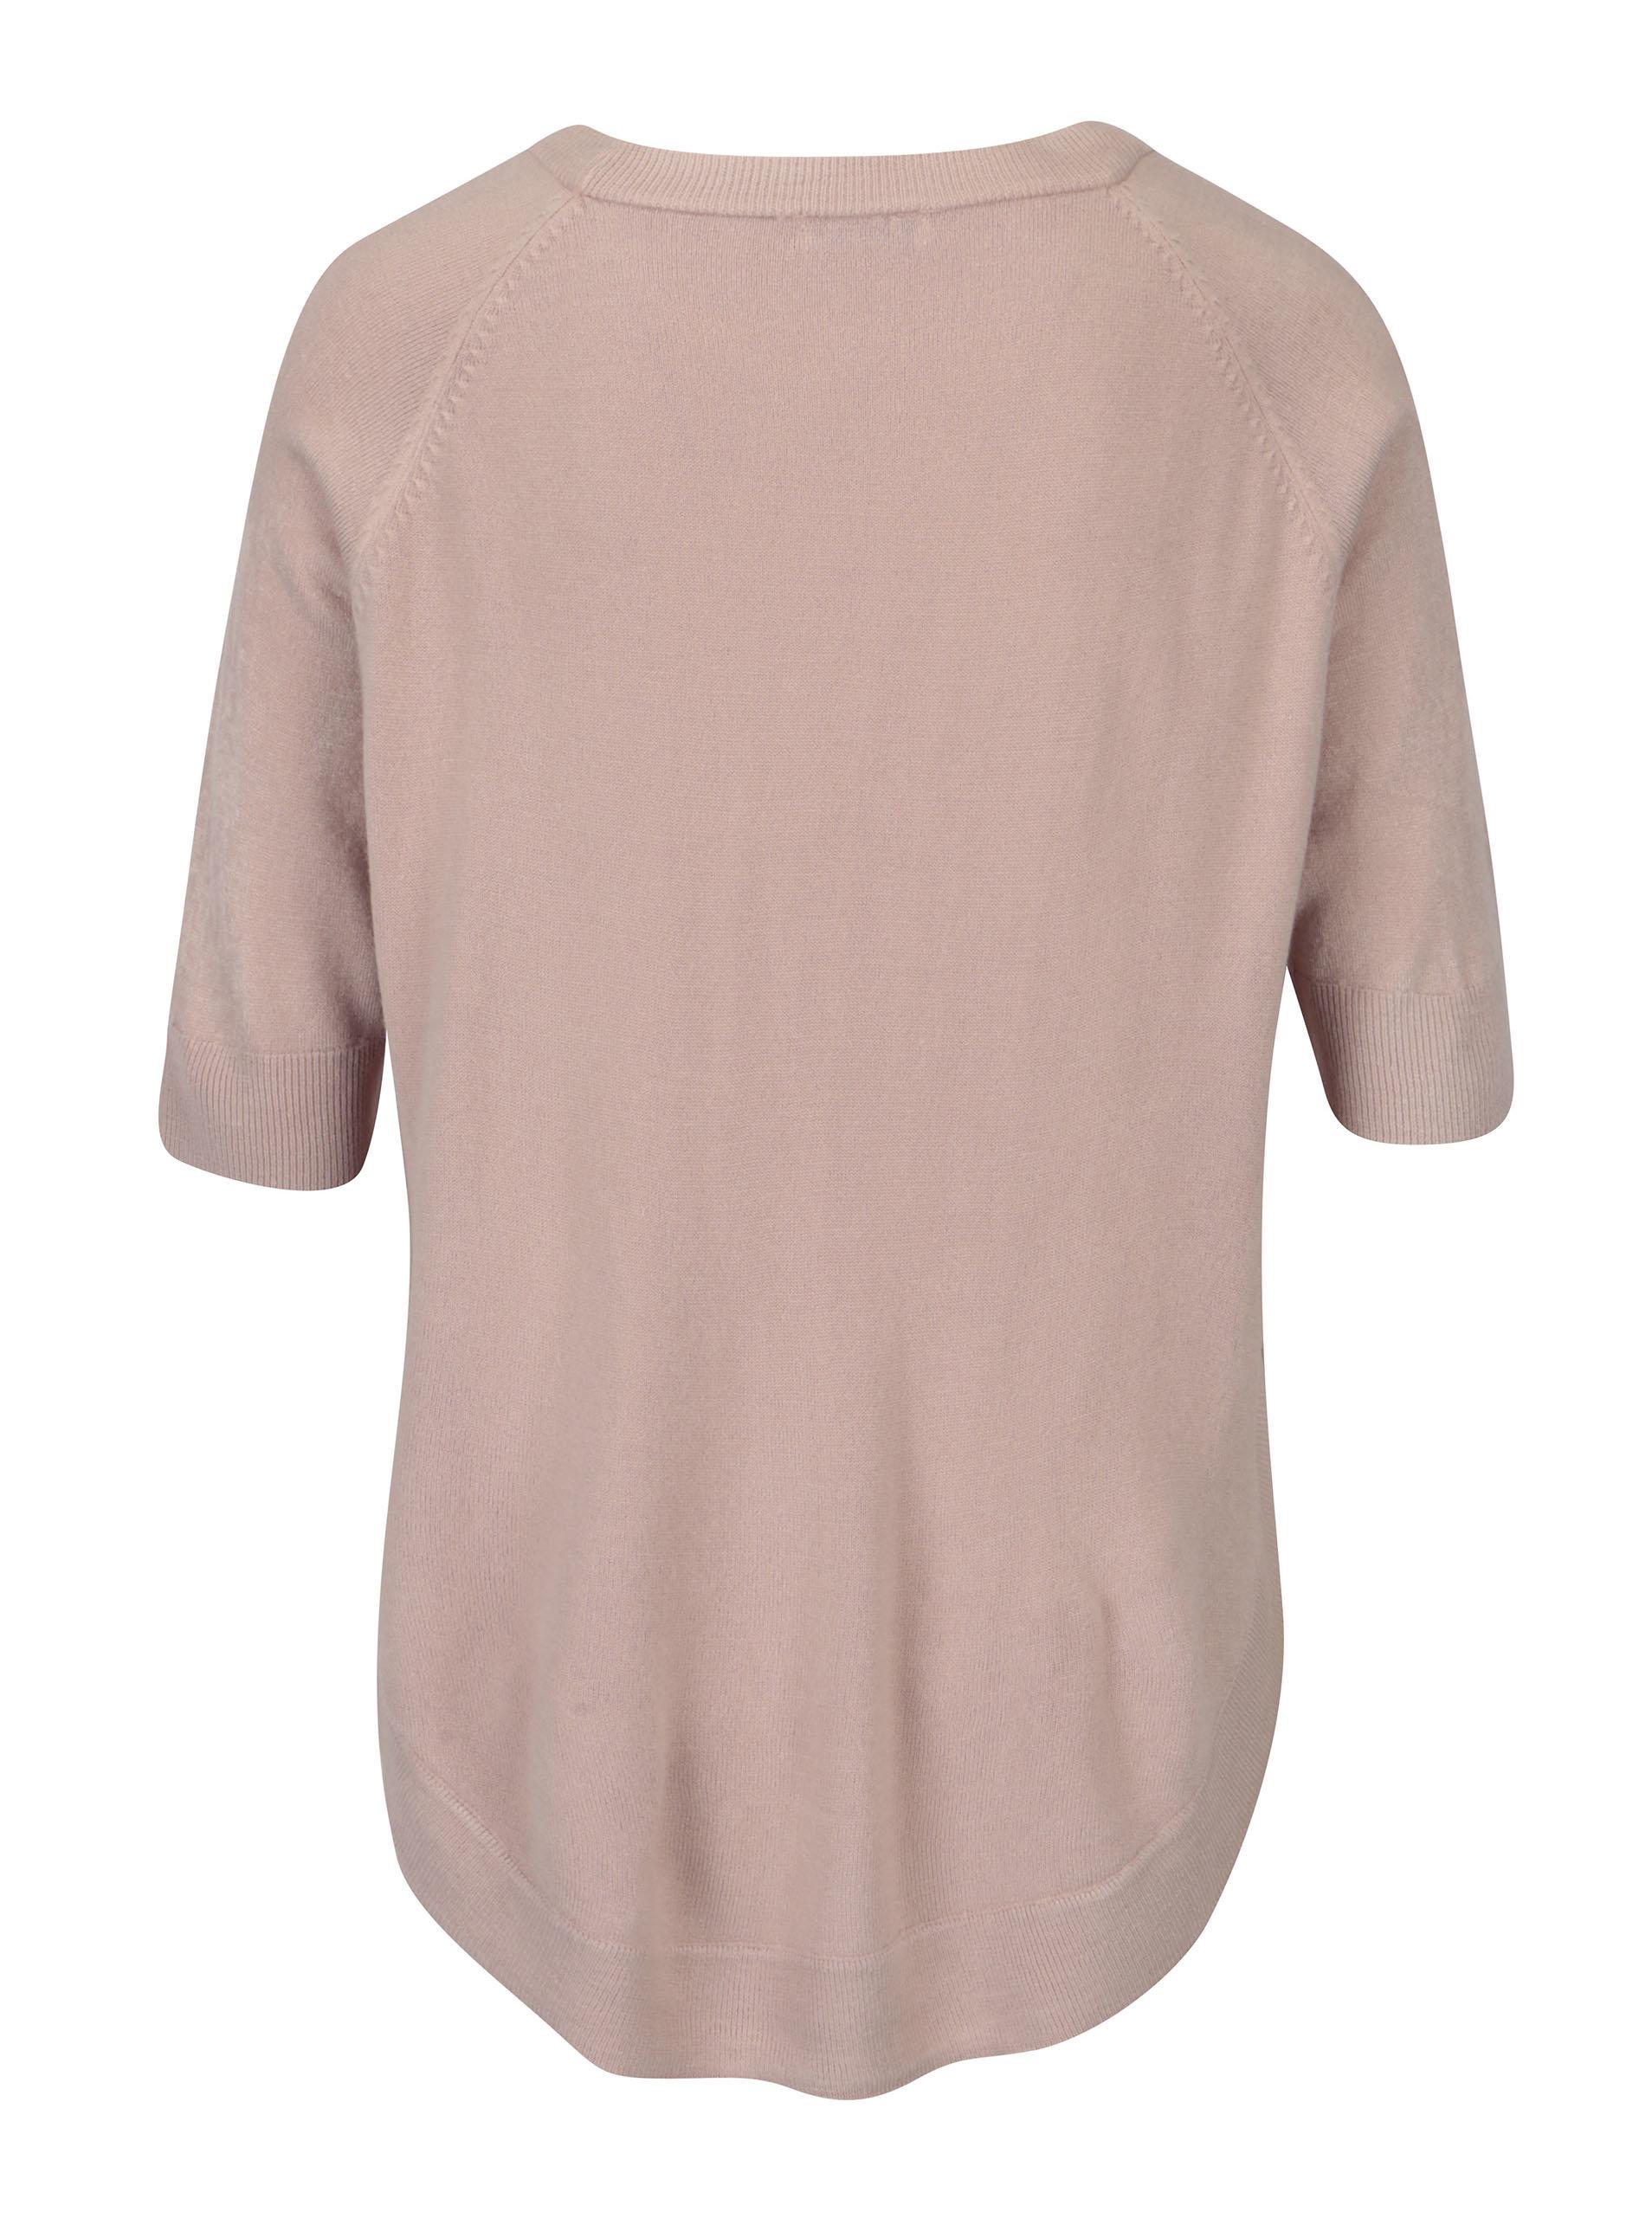 Růžový volný svetr Jacqueline de Yong Limbo ... 7dea812b72